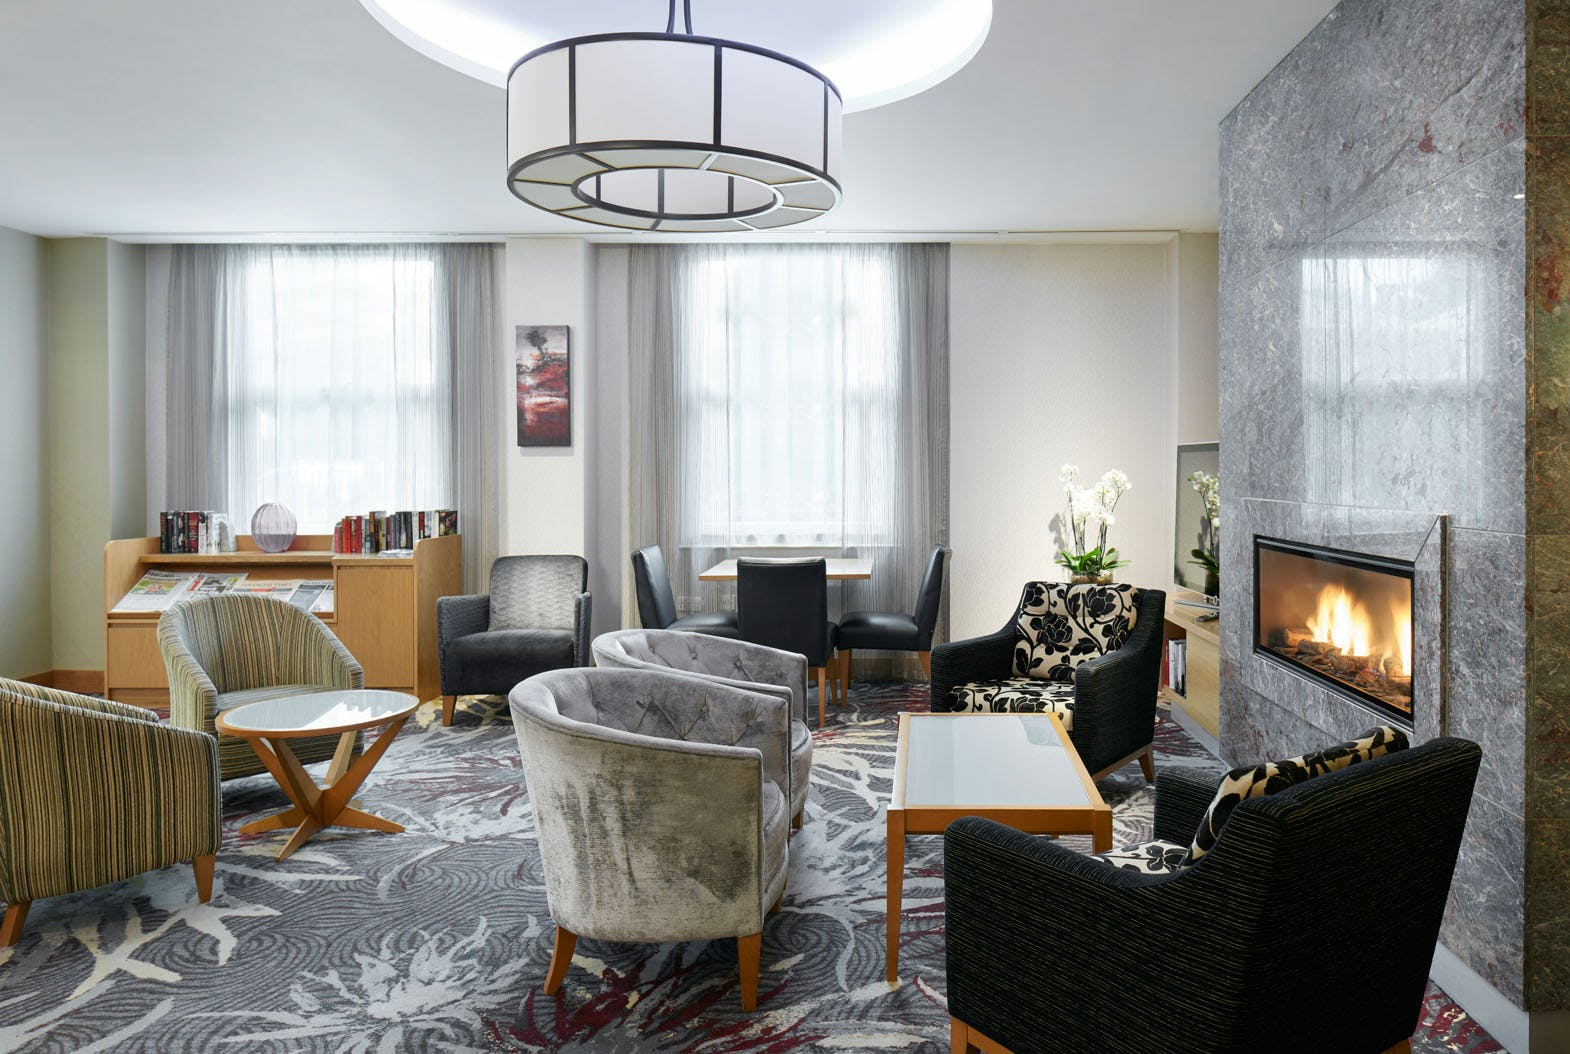 Club Living Room at Club Quarters Hotel, Lincoln's Inn Fields - Holborn, London